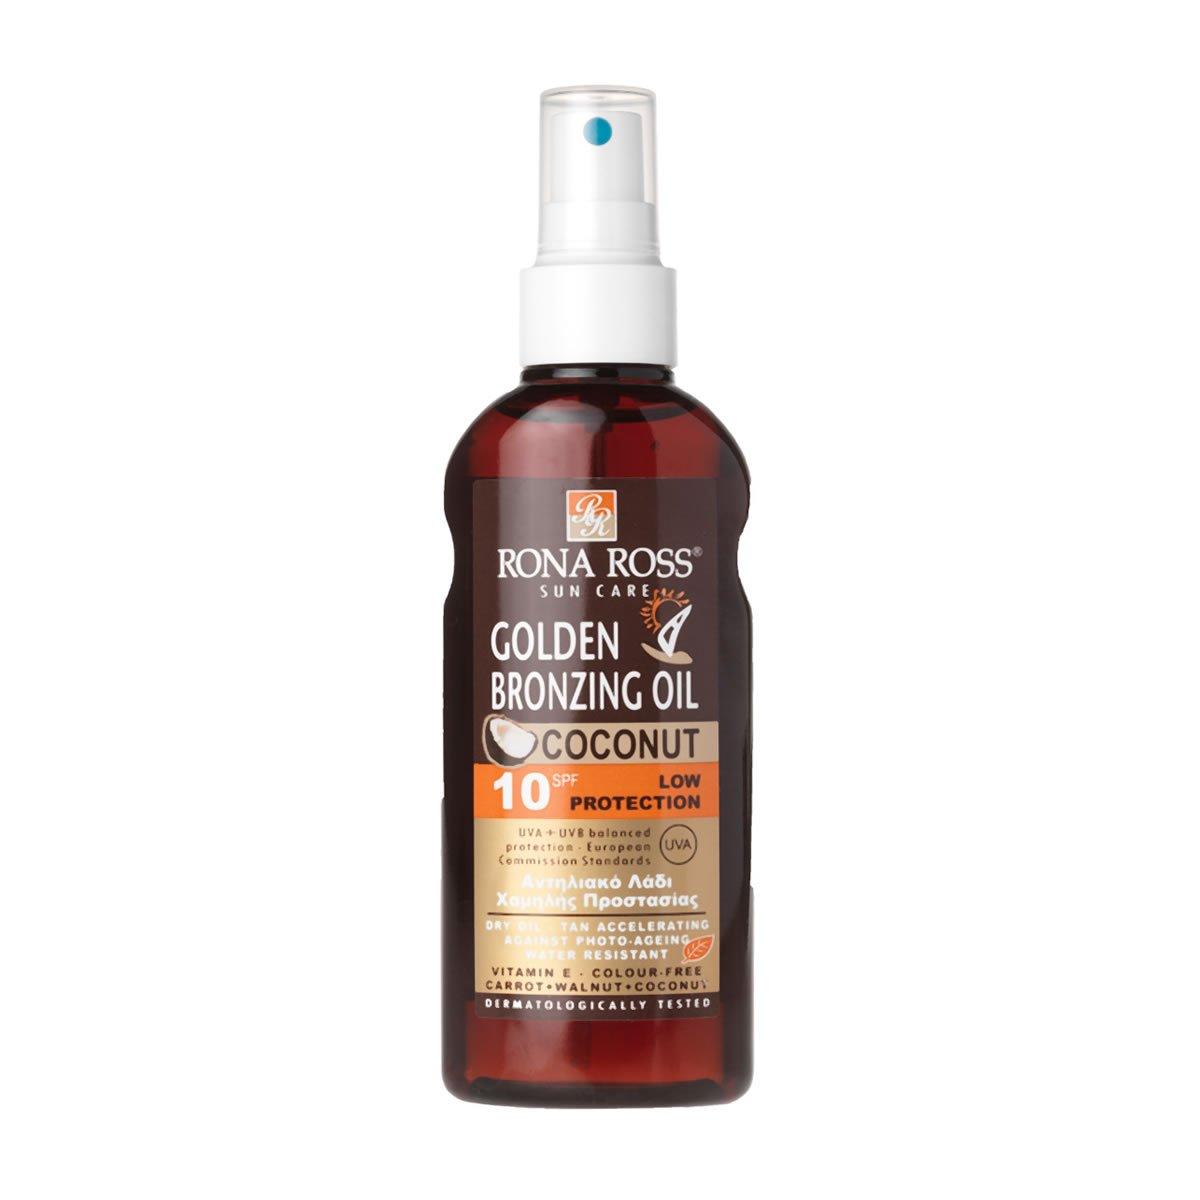 Rona Ross Coconut Golden Bronzing Oil Spray SPF 10, 160ml 2742